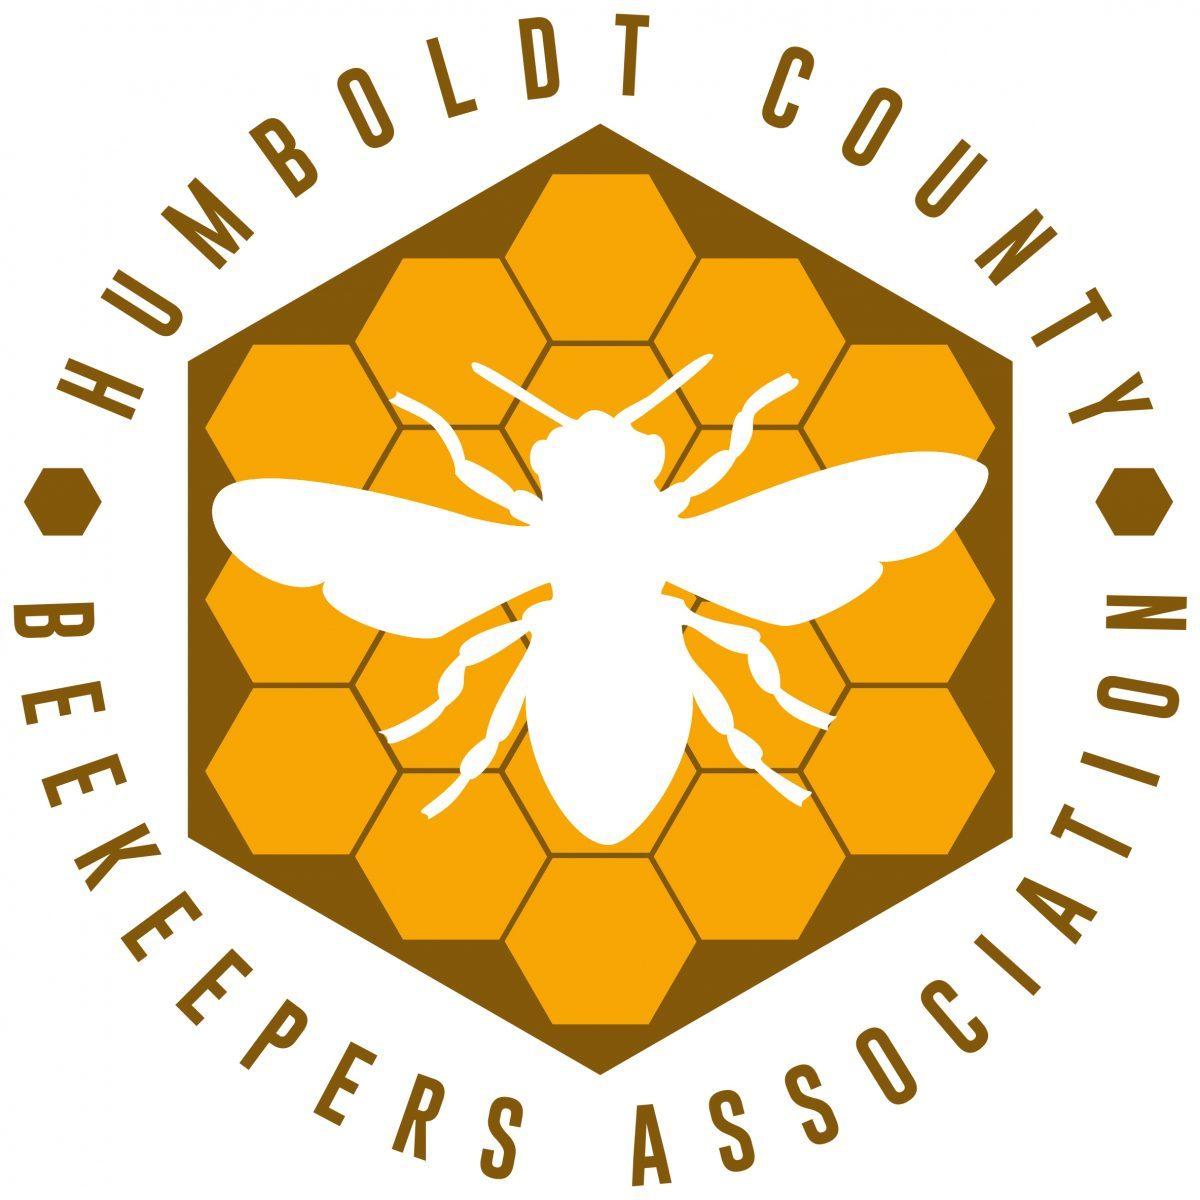 Humboldt County Beekeepers Association logo